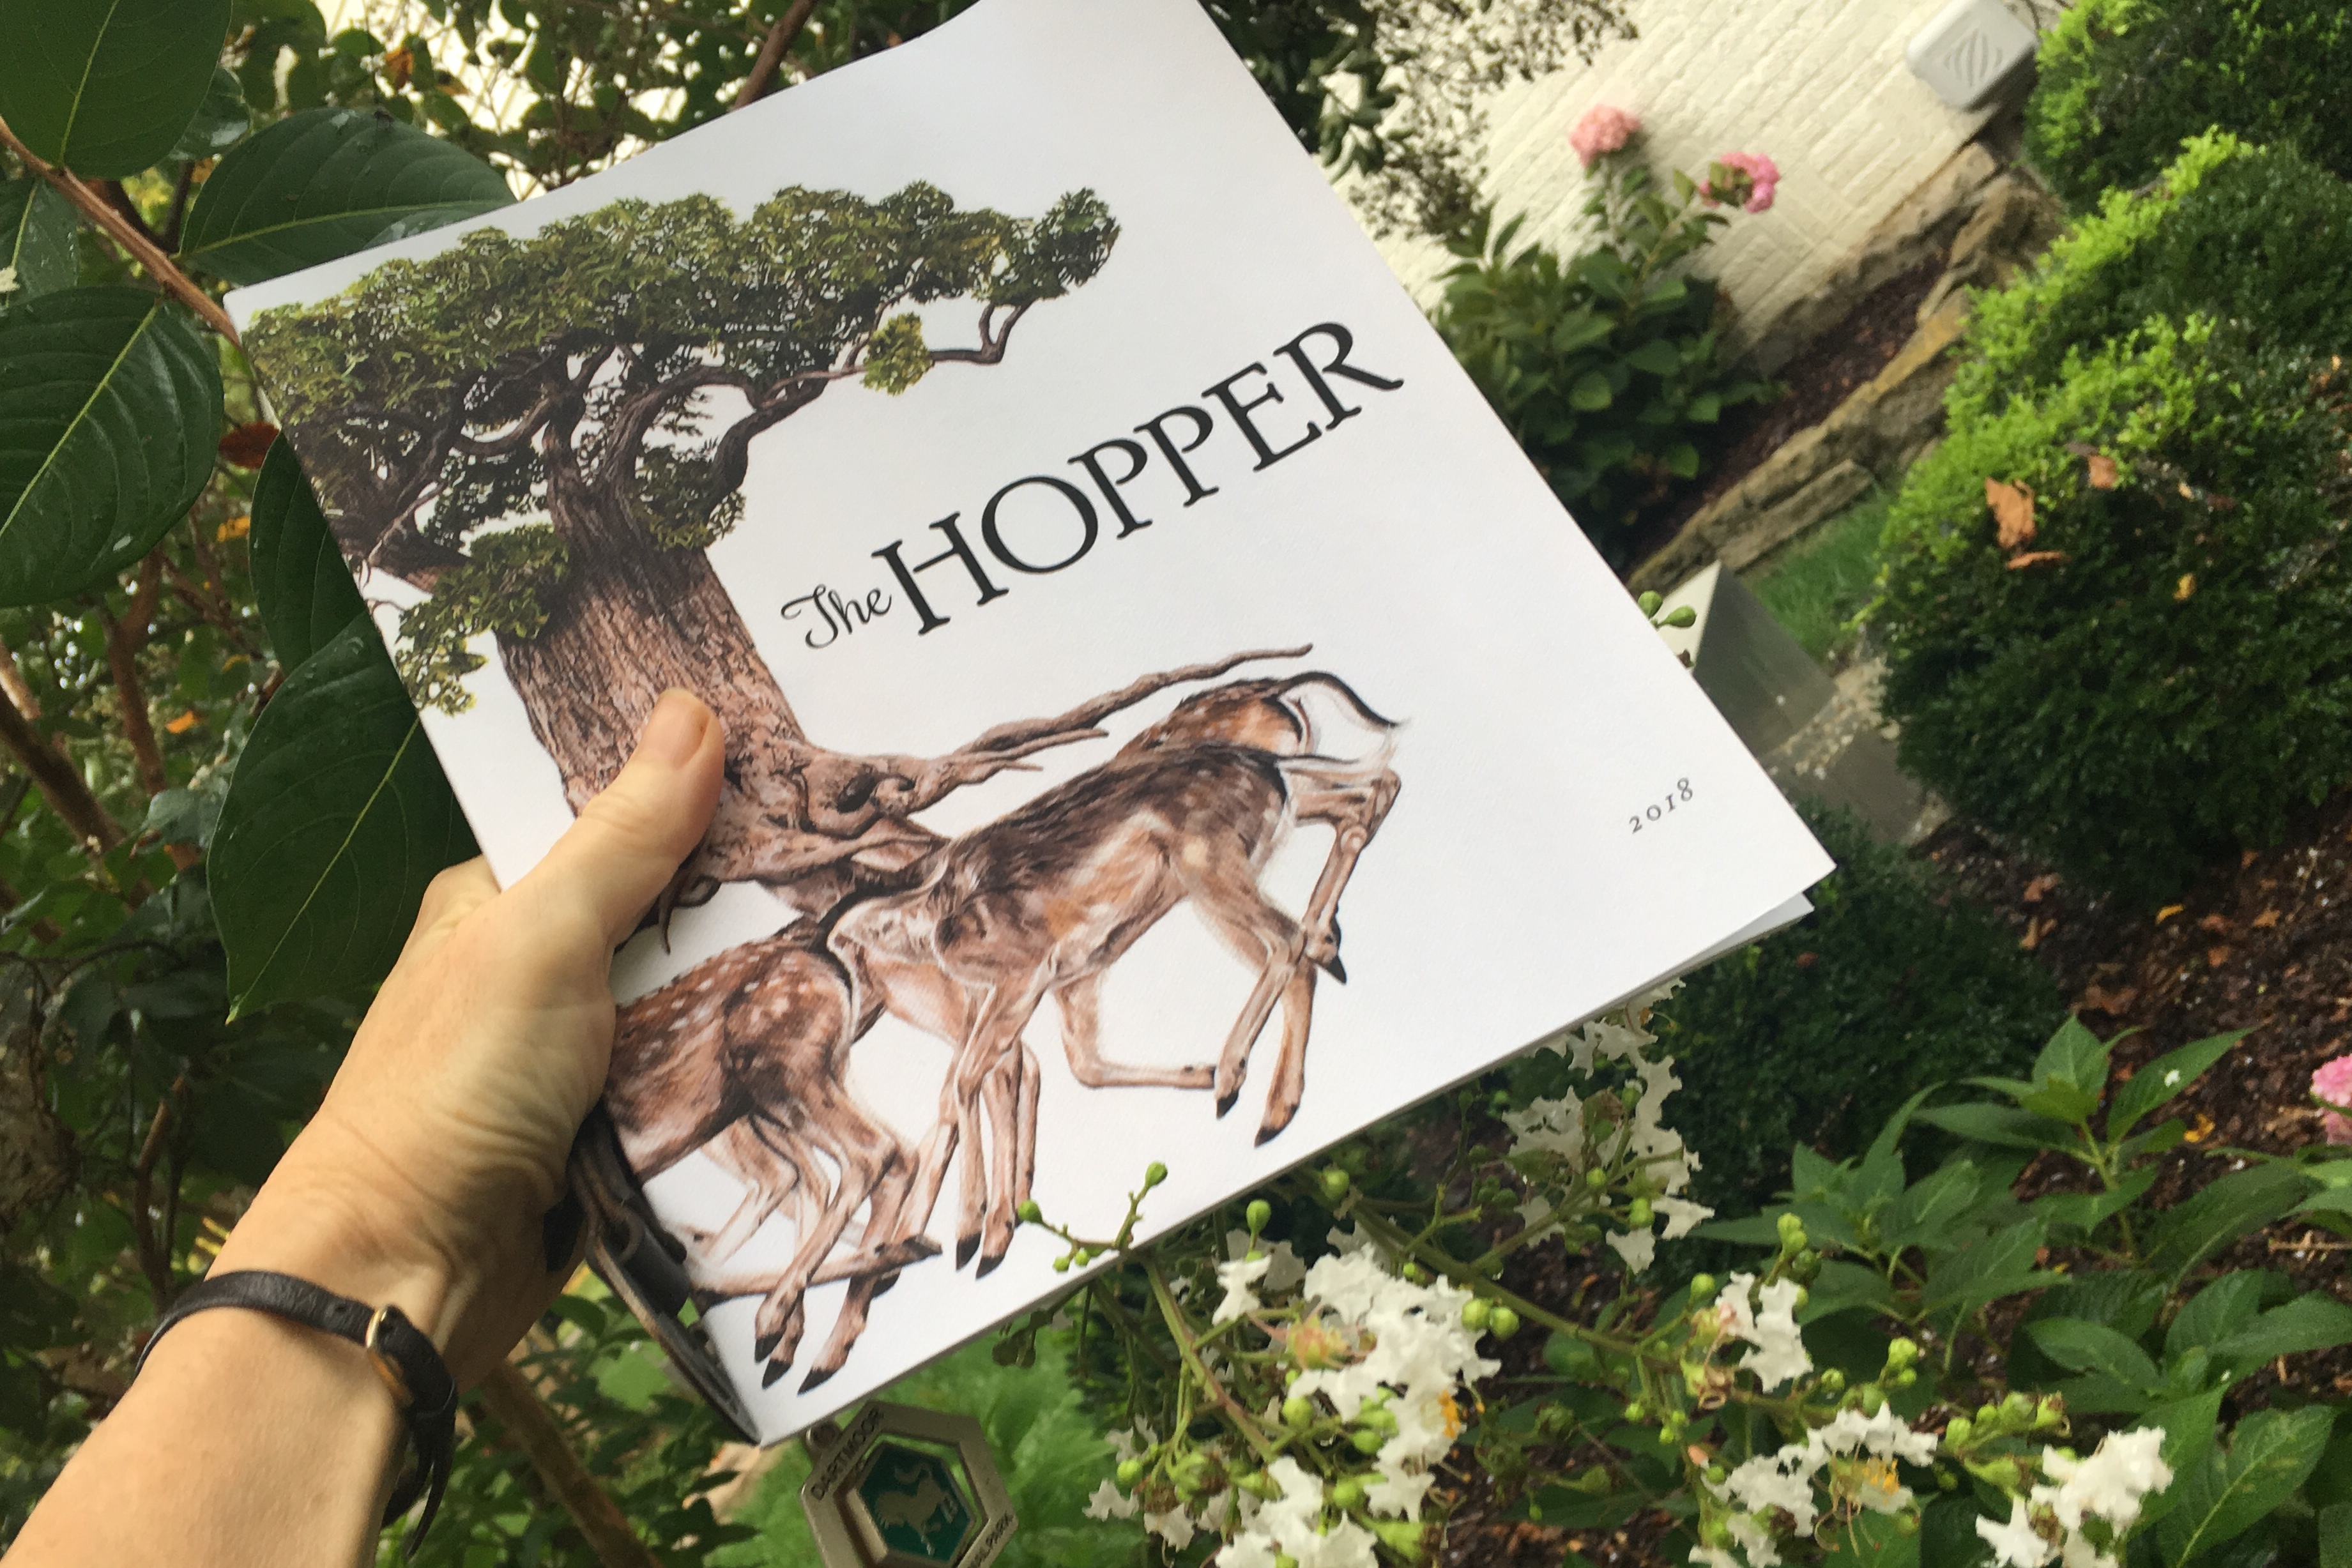 HopperWhiteTree